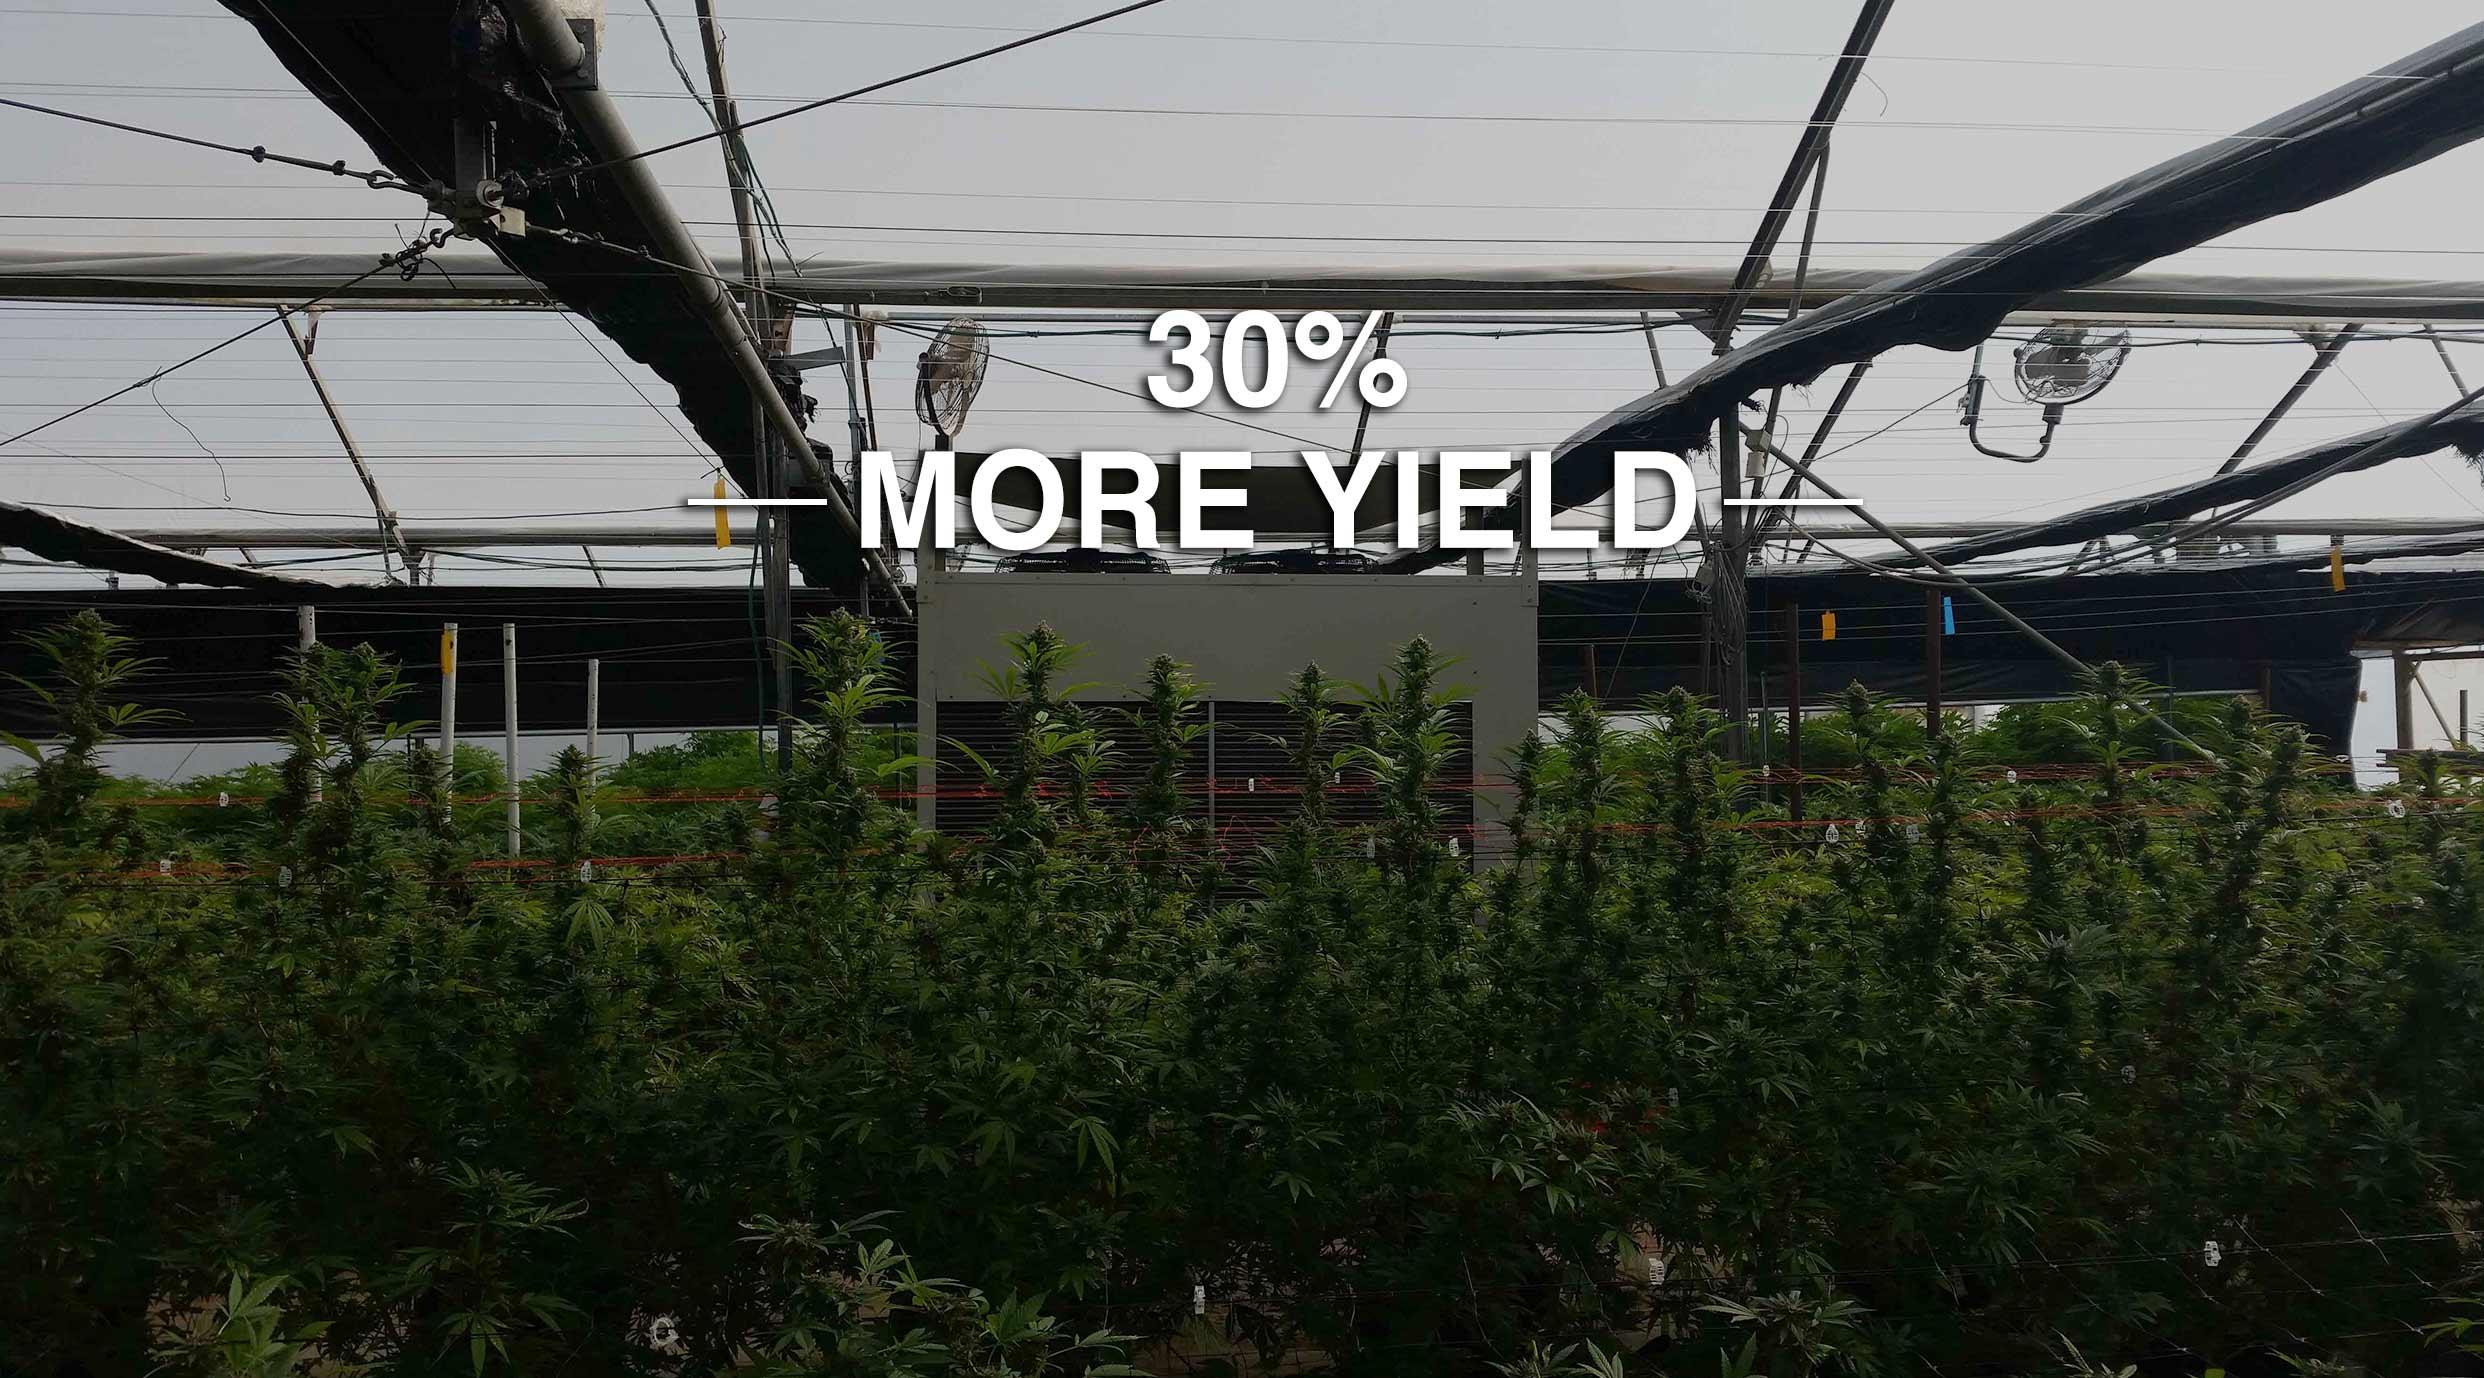 Drygair greenhouse dehumidifier 30% more yield